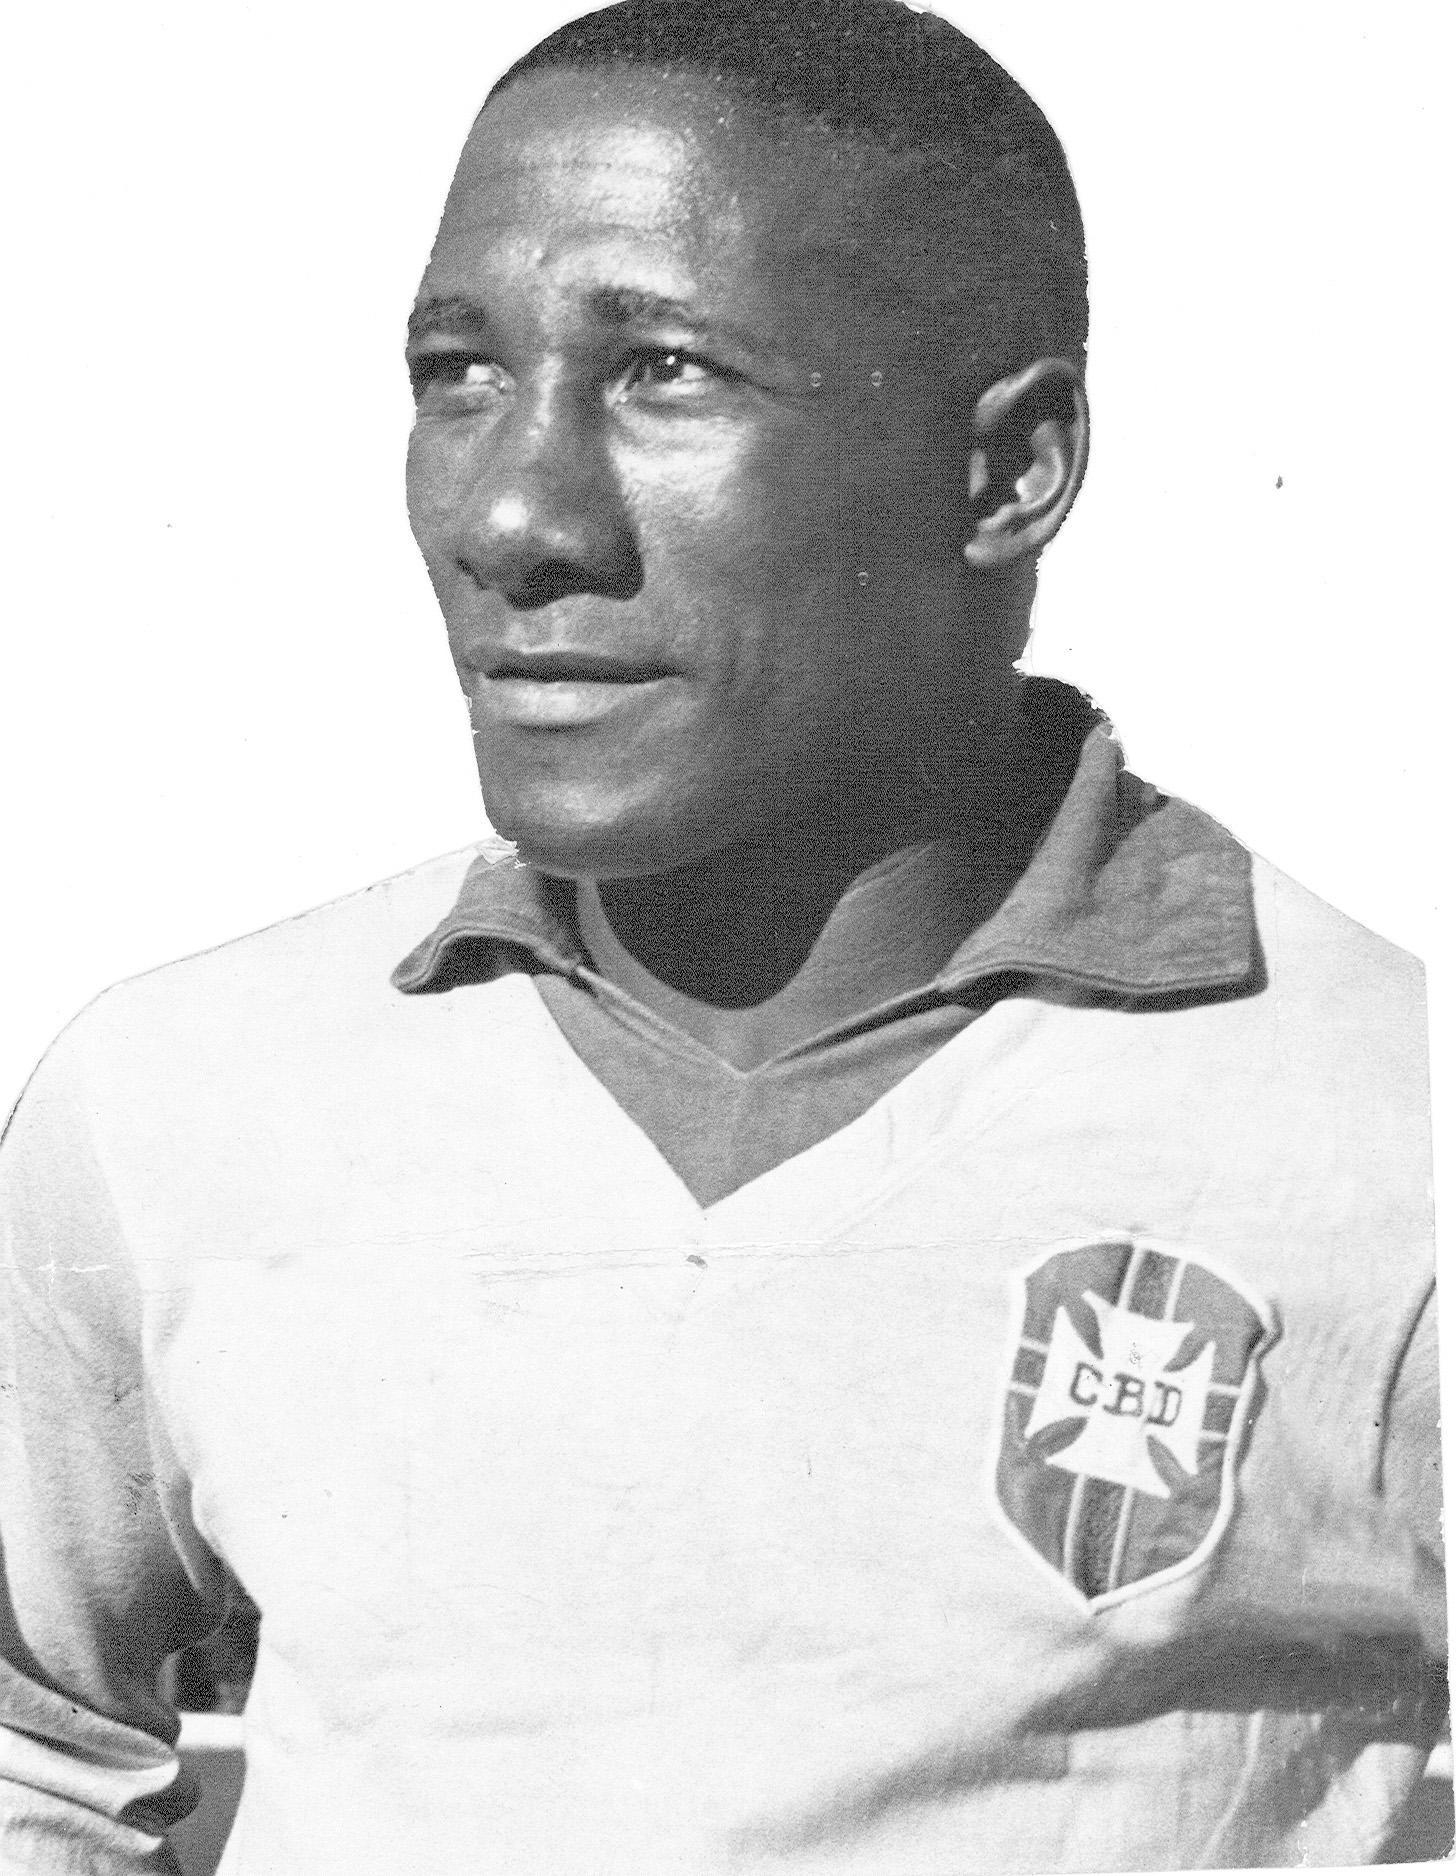 Djalma Santos, Brezilyalı eski futbolcu. (DY-1929) tarihte bugün